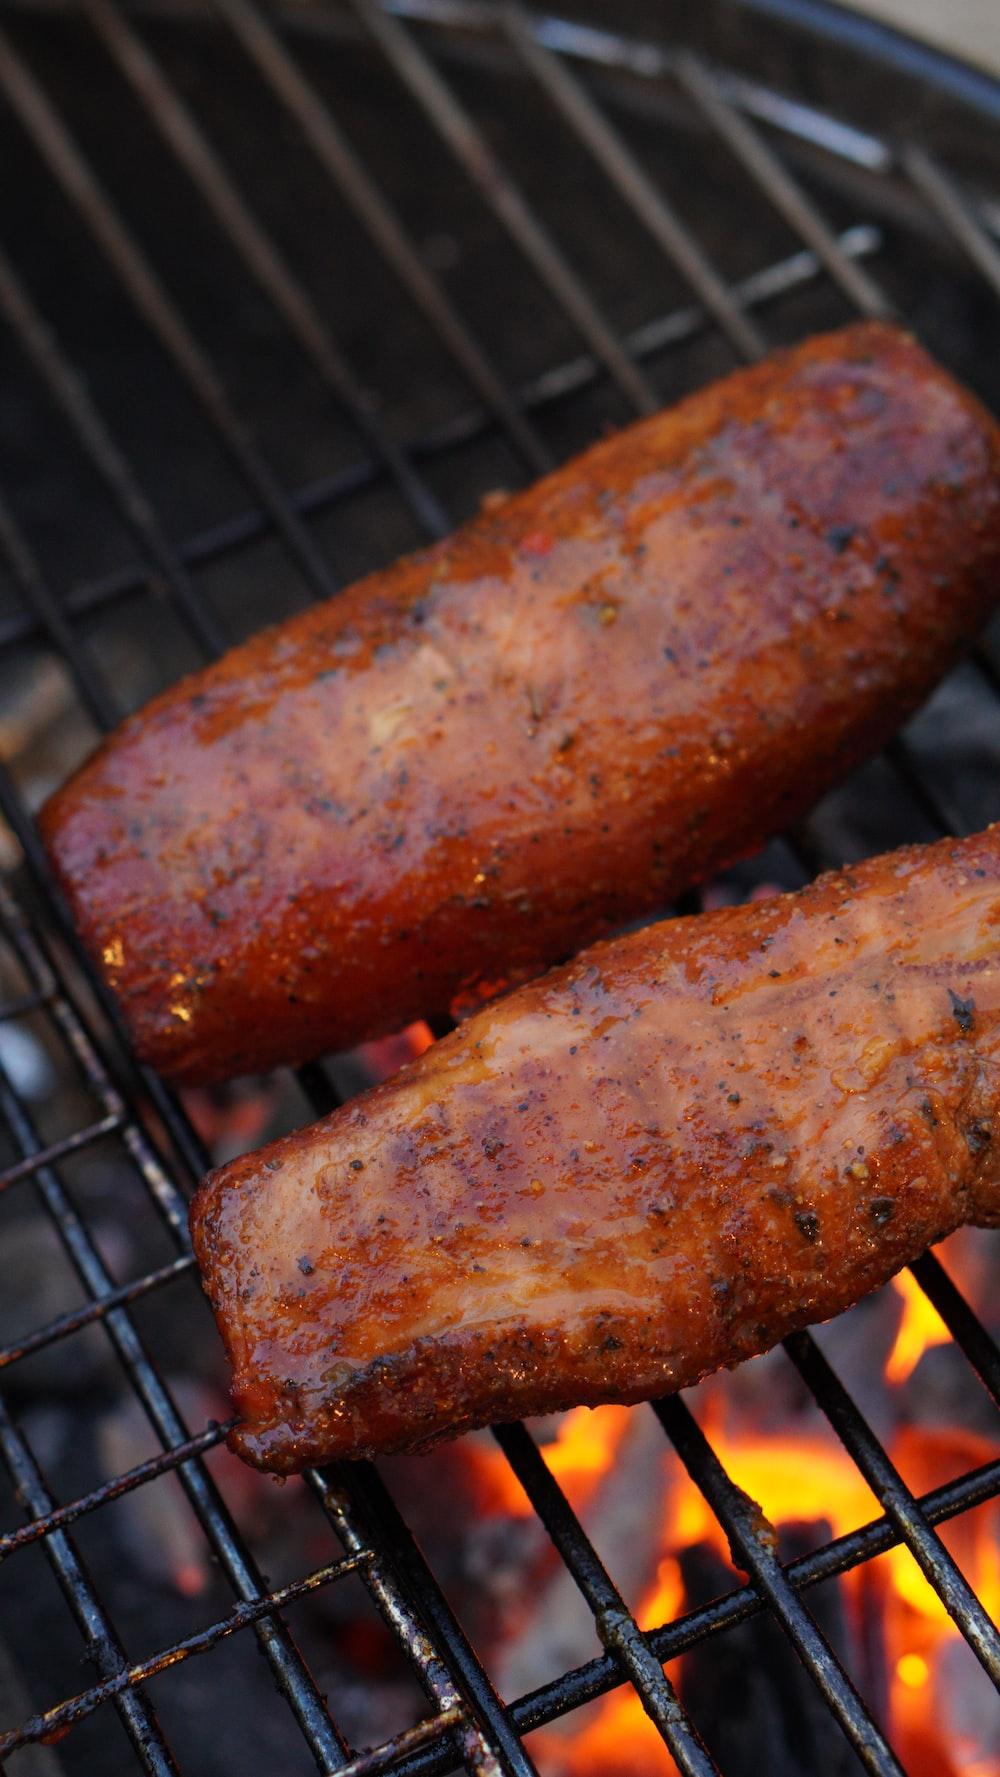 grilled sausage on black metal grill